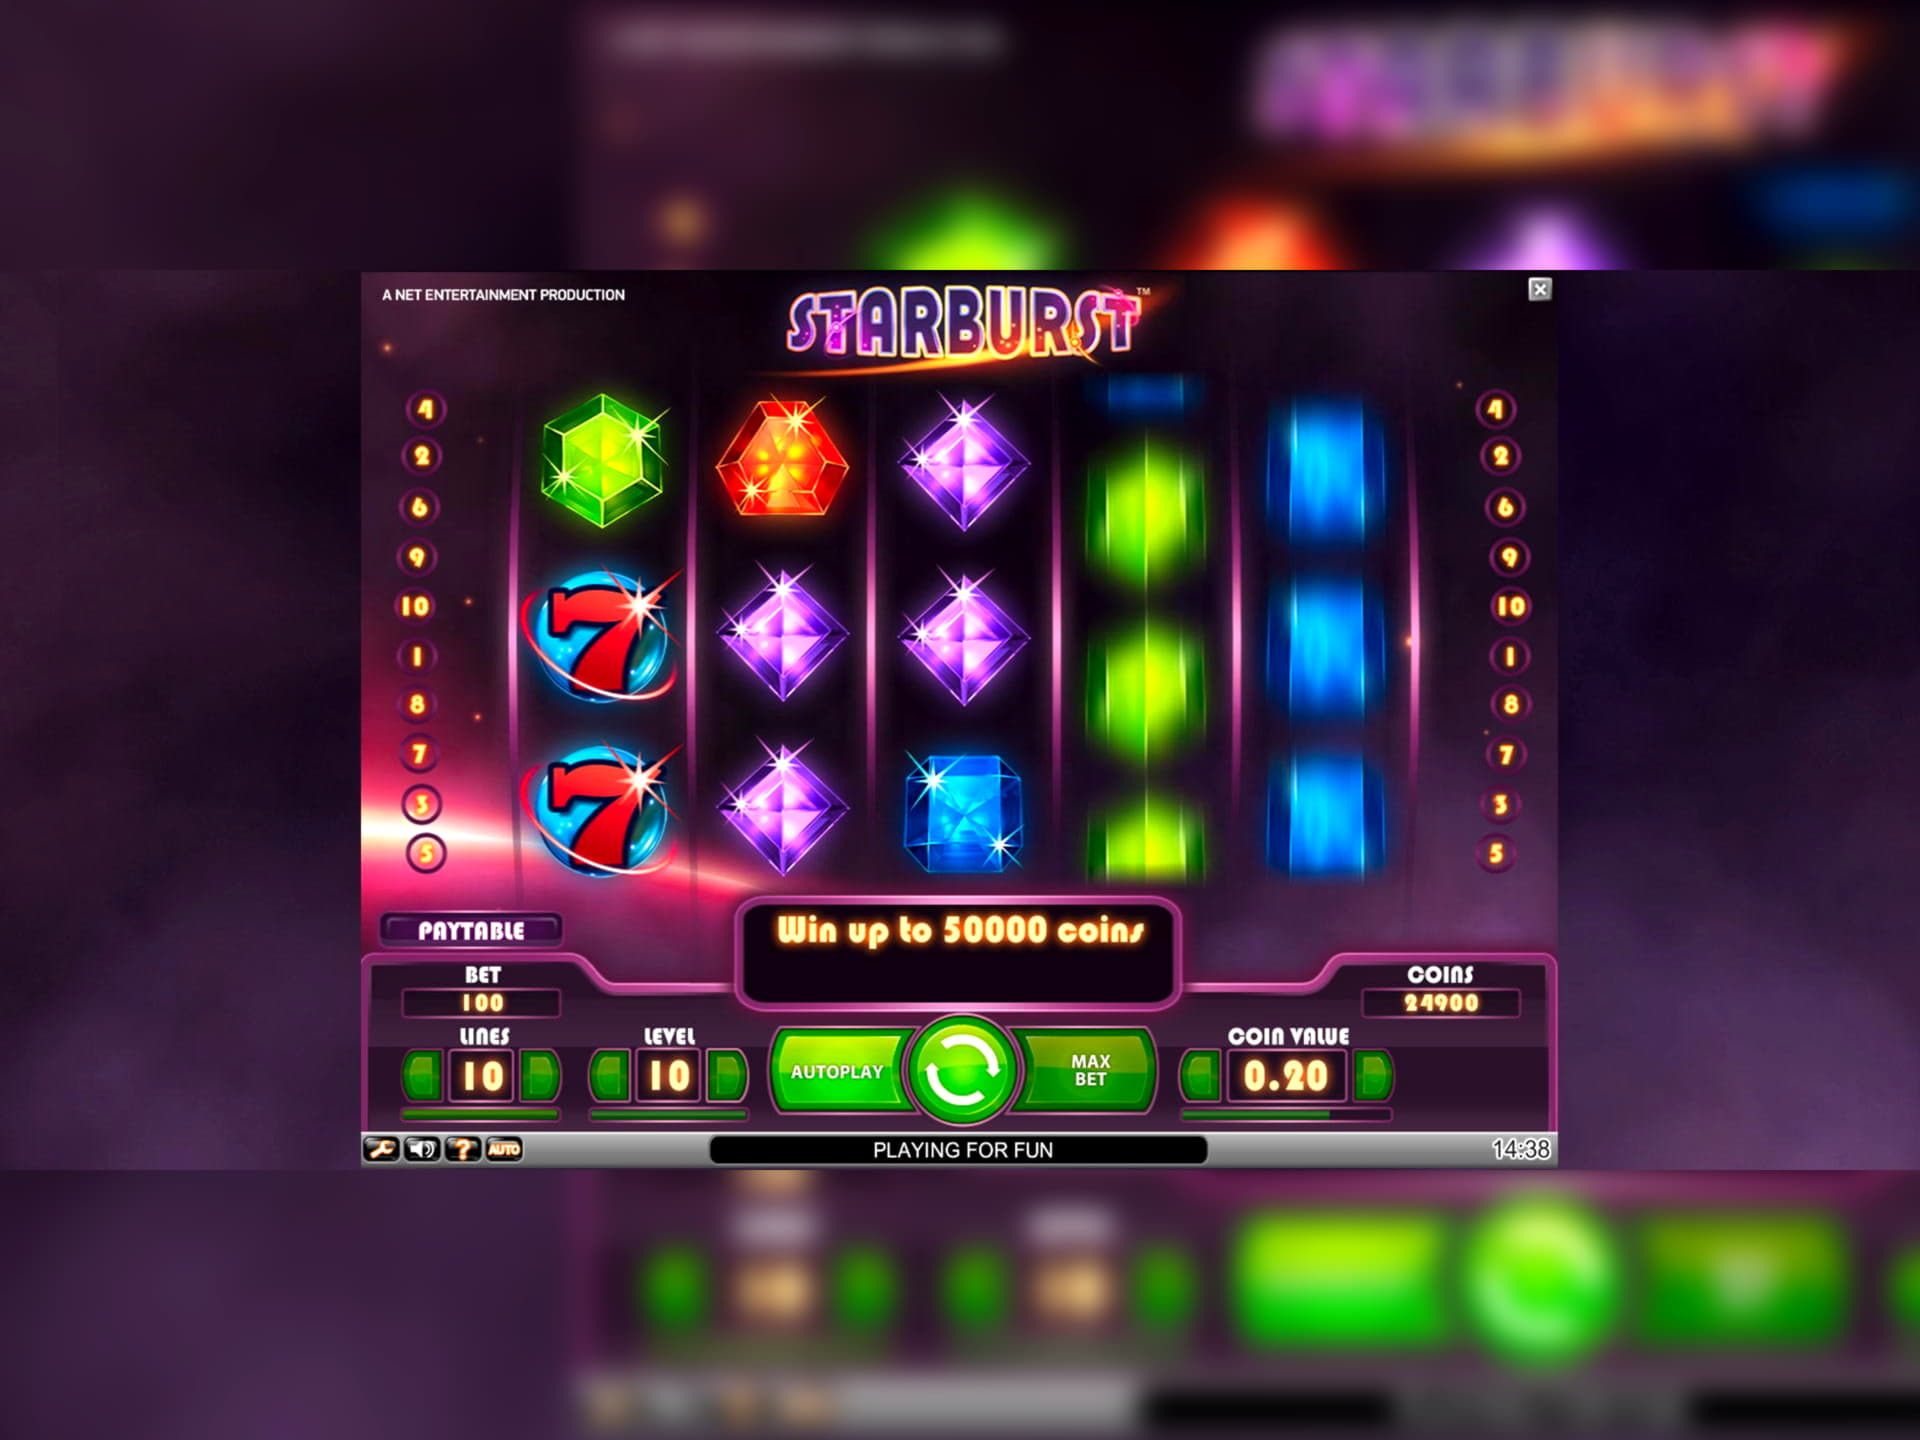 15 Free spins no deposit at Slotty Dubai Casino